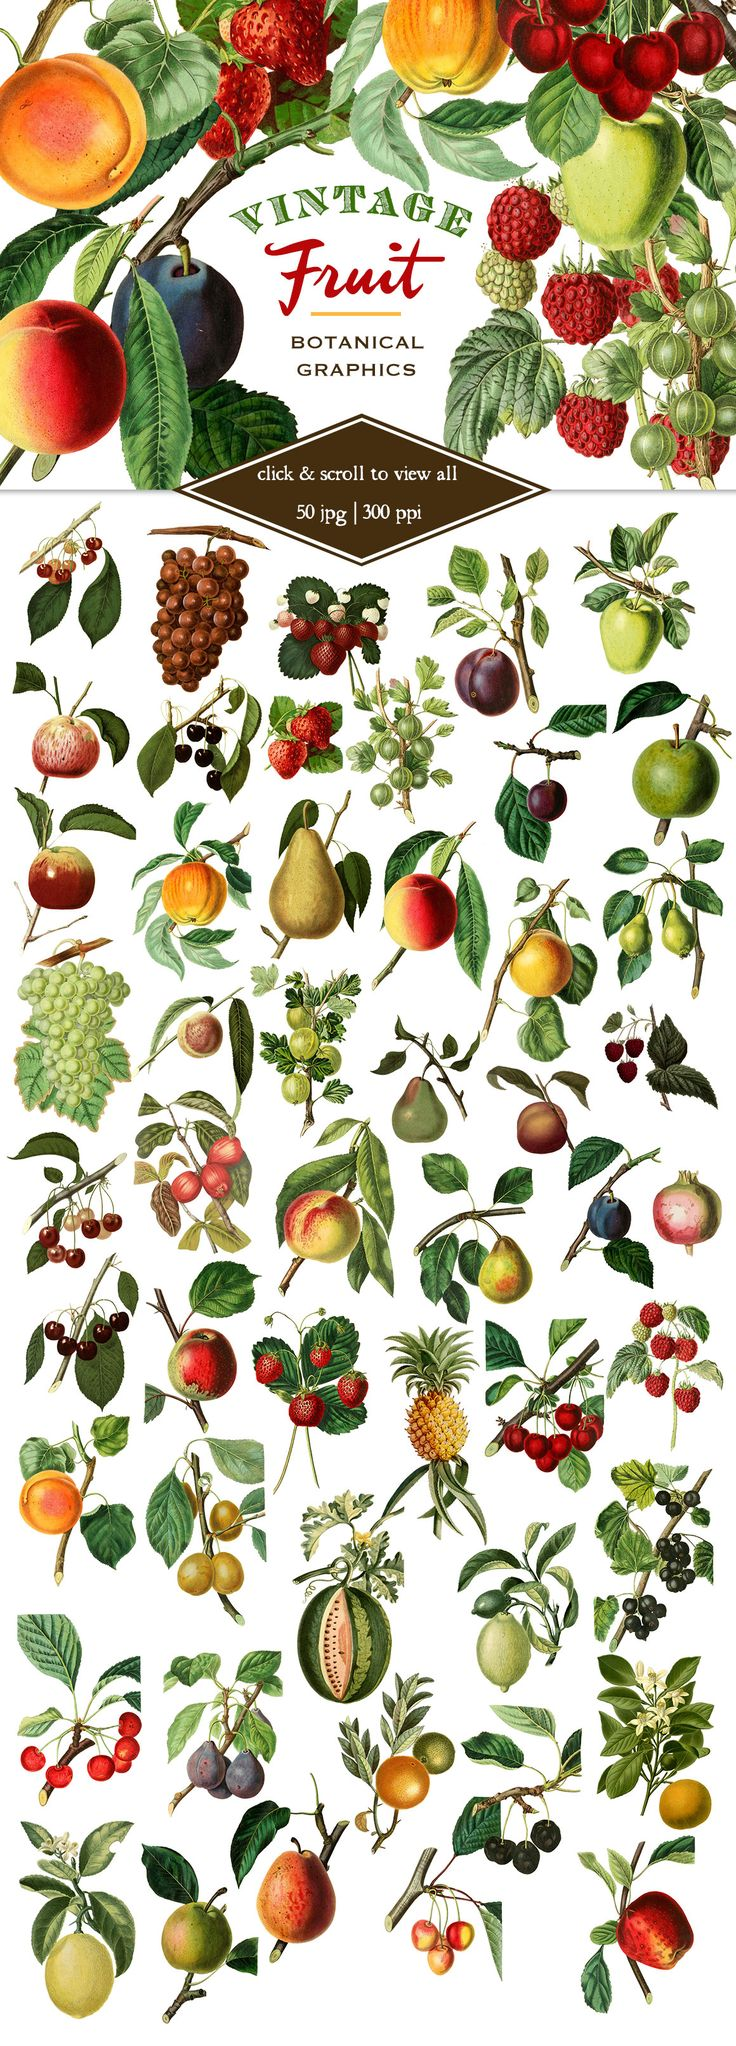 Vintage Fruit Botanical Graphics by Eclectic Anthology on Creative Market